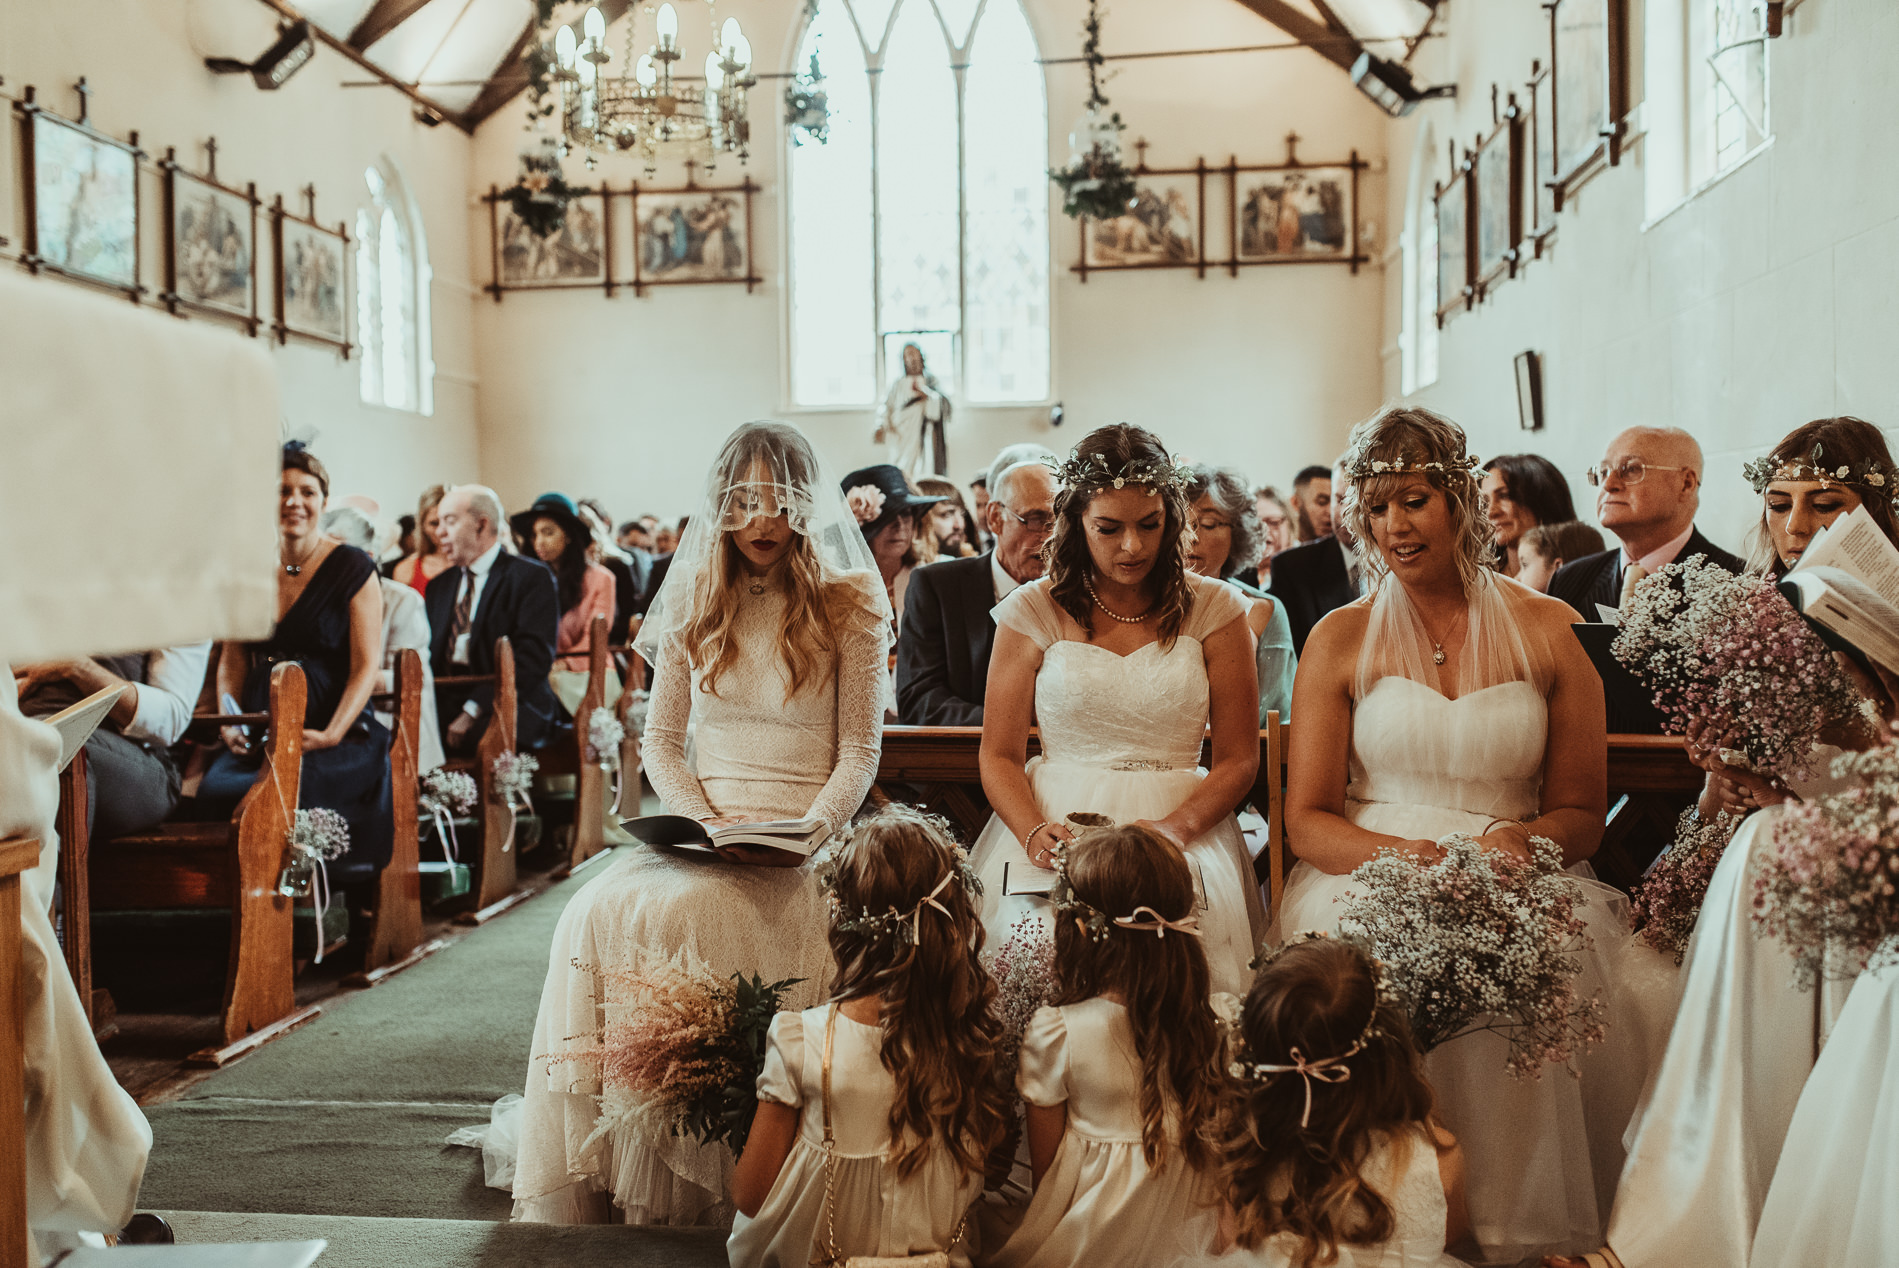 bohemian_wedding_lawshall_church_garden38